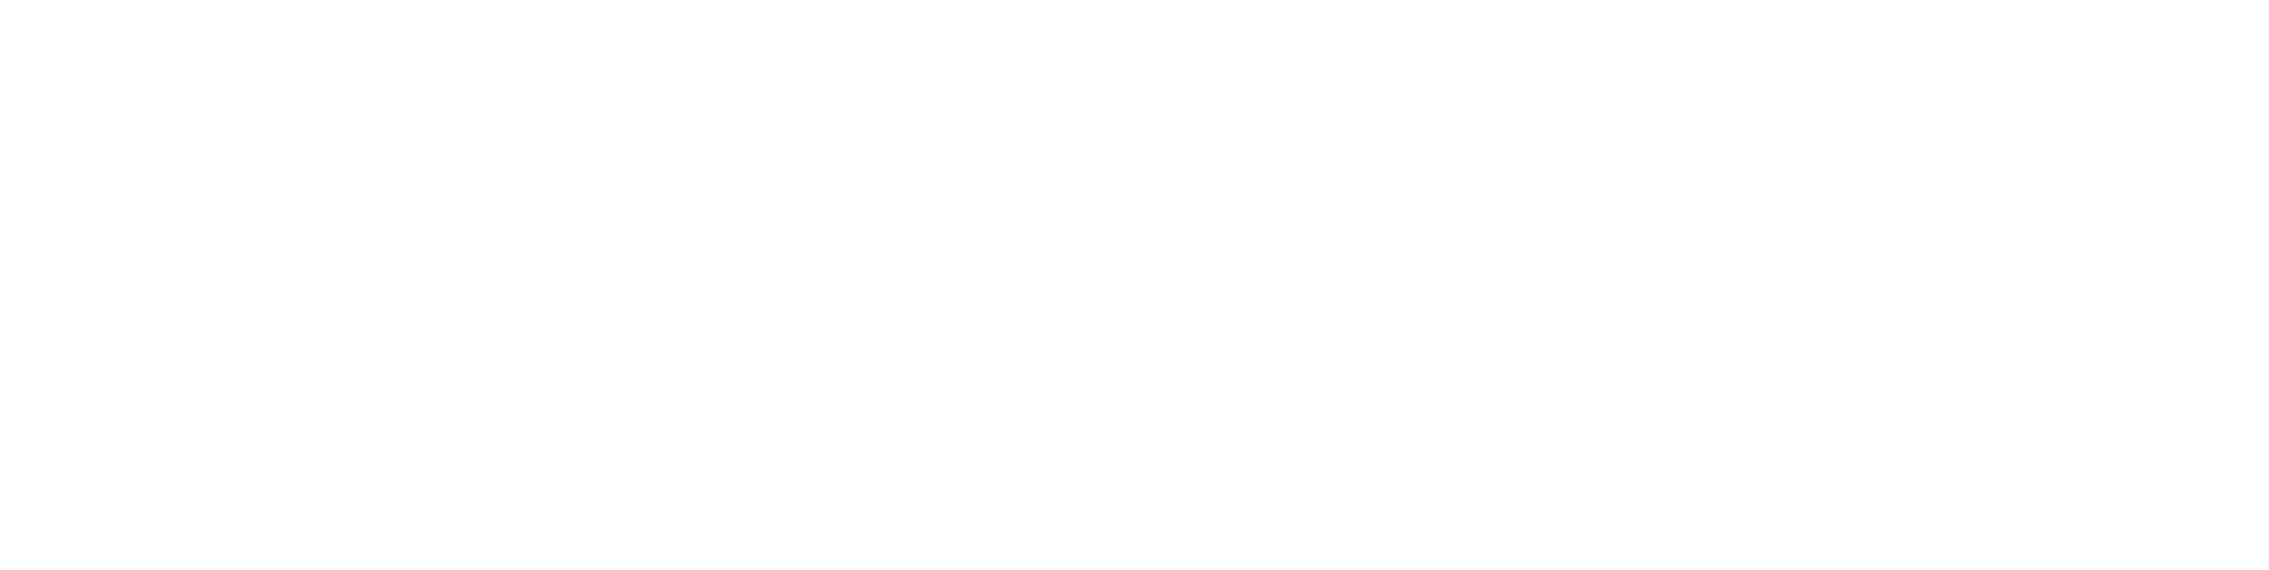 Obituaries Longview Tx The Cammack Family Welch